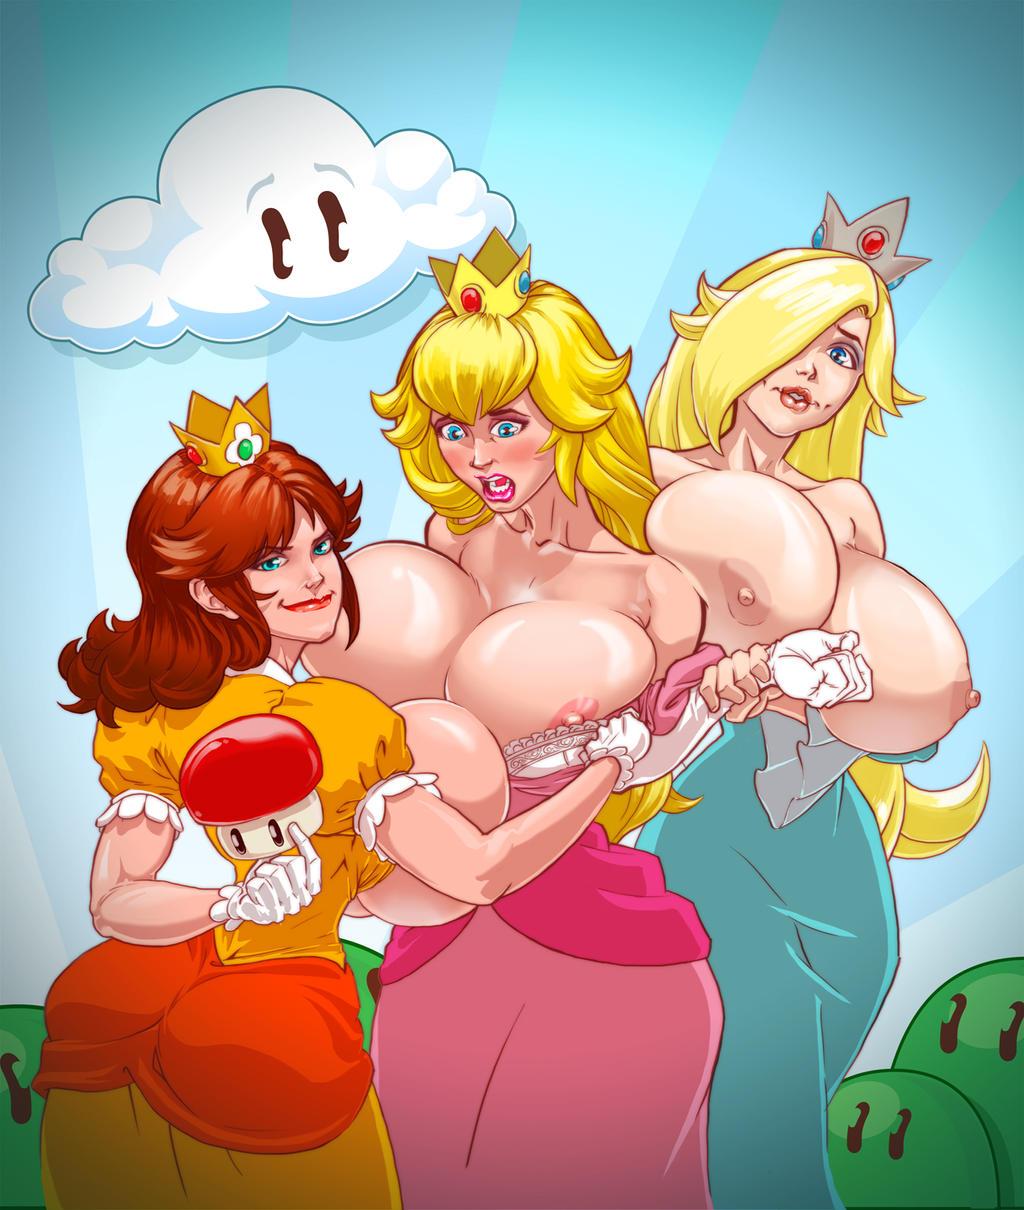 Princess daisy and rosalina rule 34 nudes video